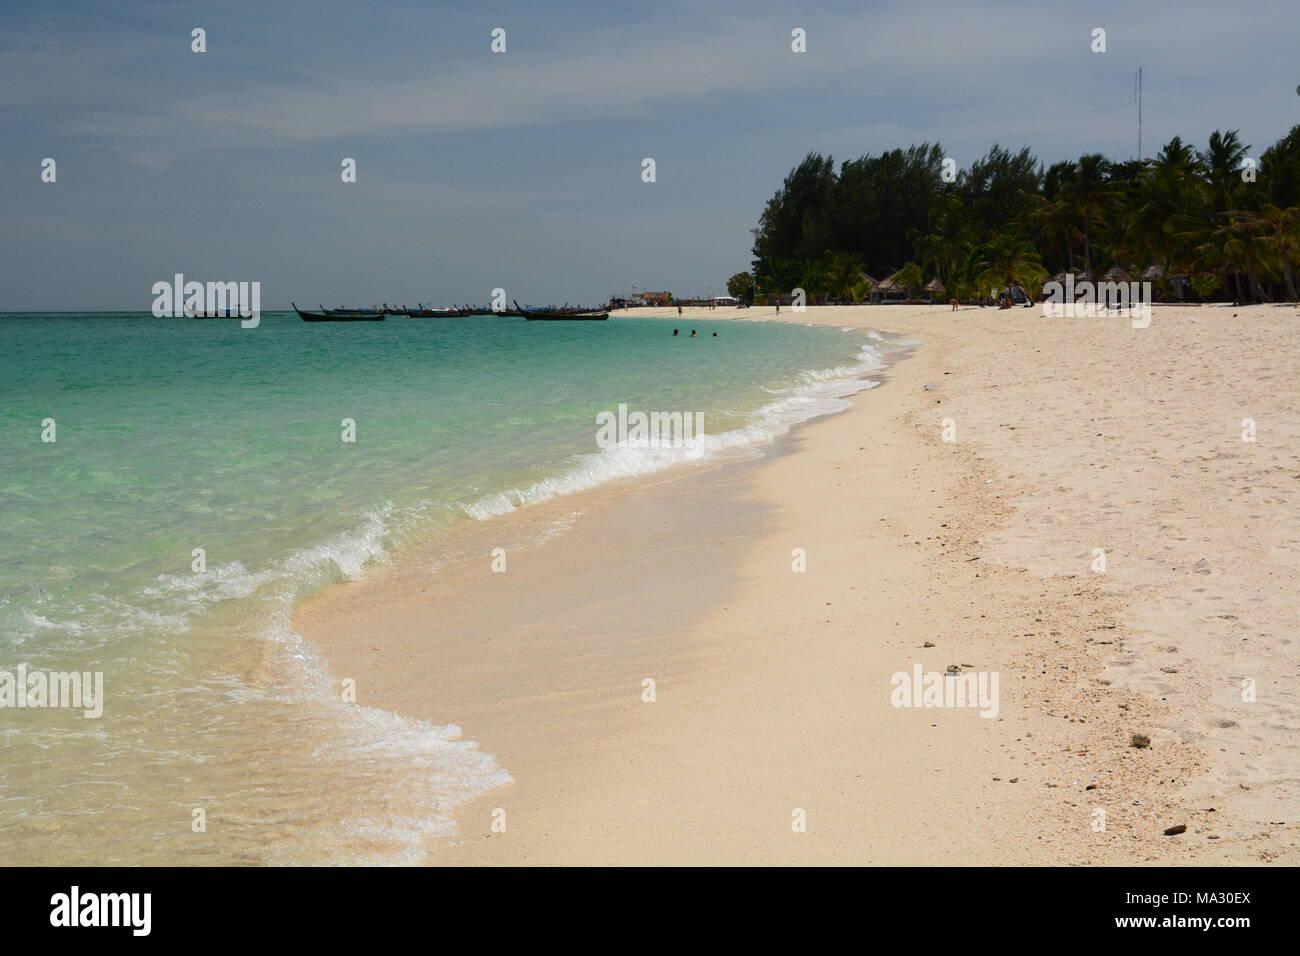 Sunrise Beach. Koh Lipe. Tarutao national marine park. Satun province. Thailand - Stock Image